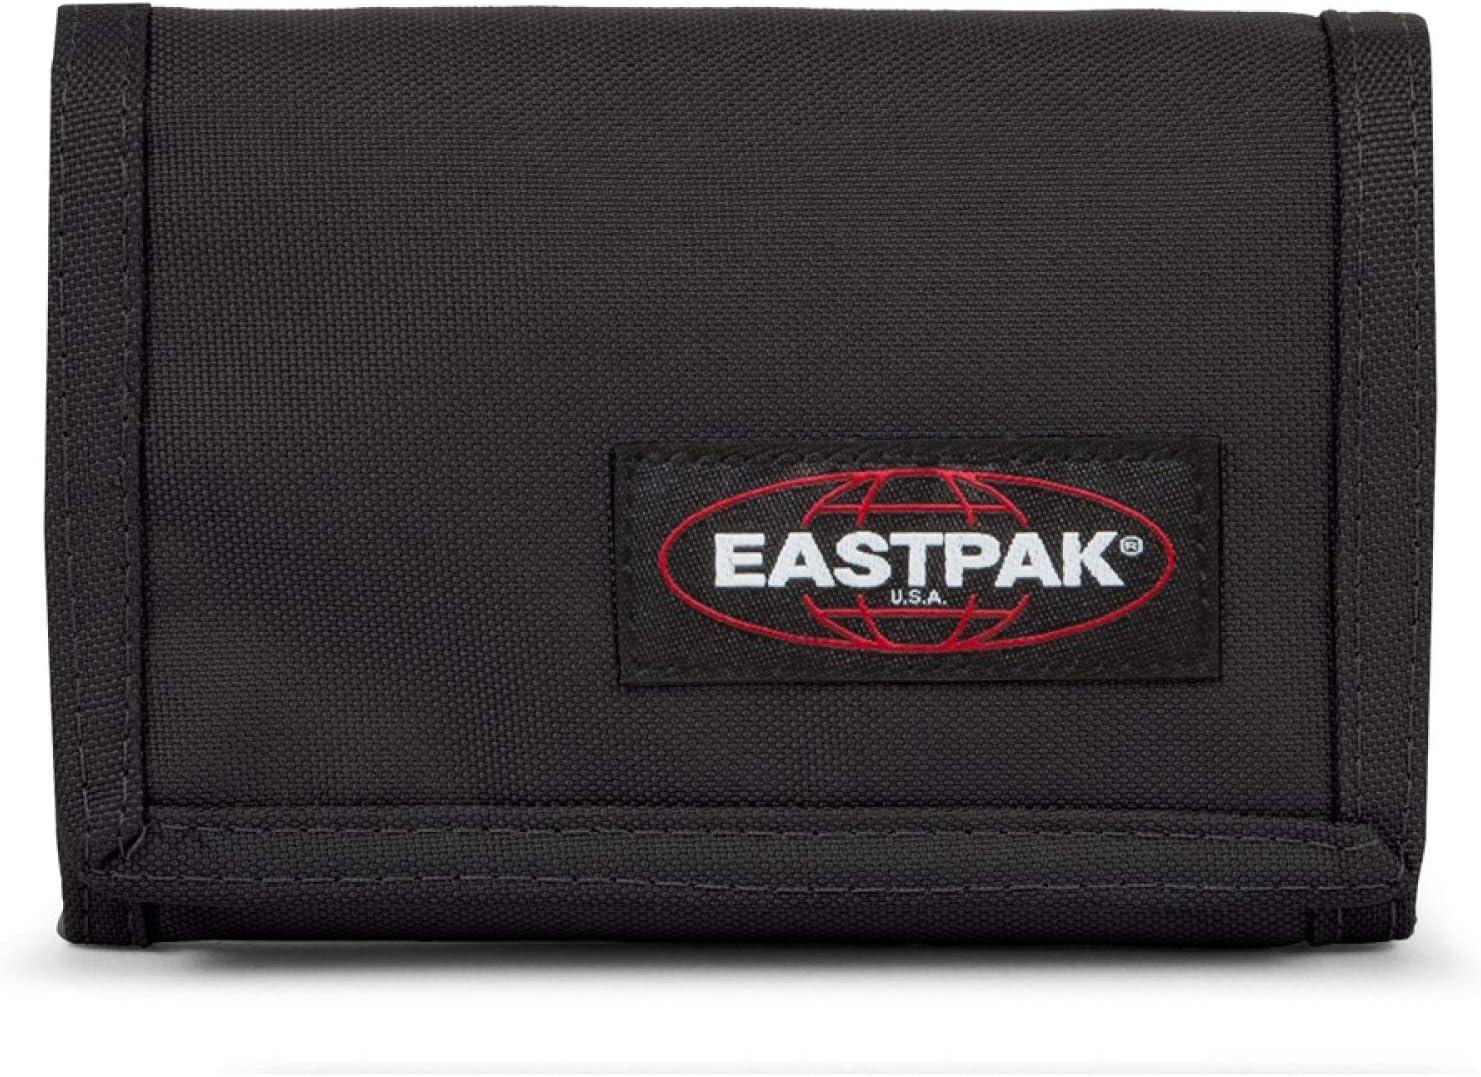 Eastpak - Crew Single - Black